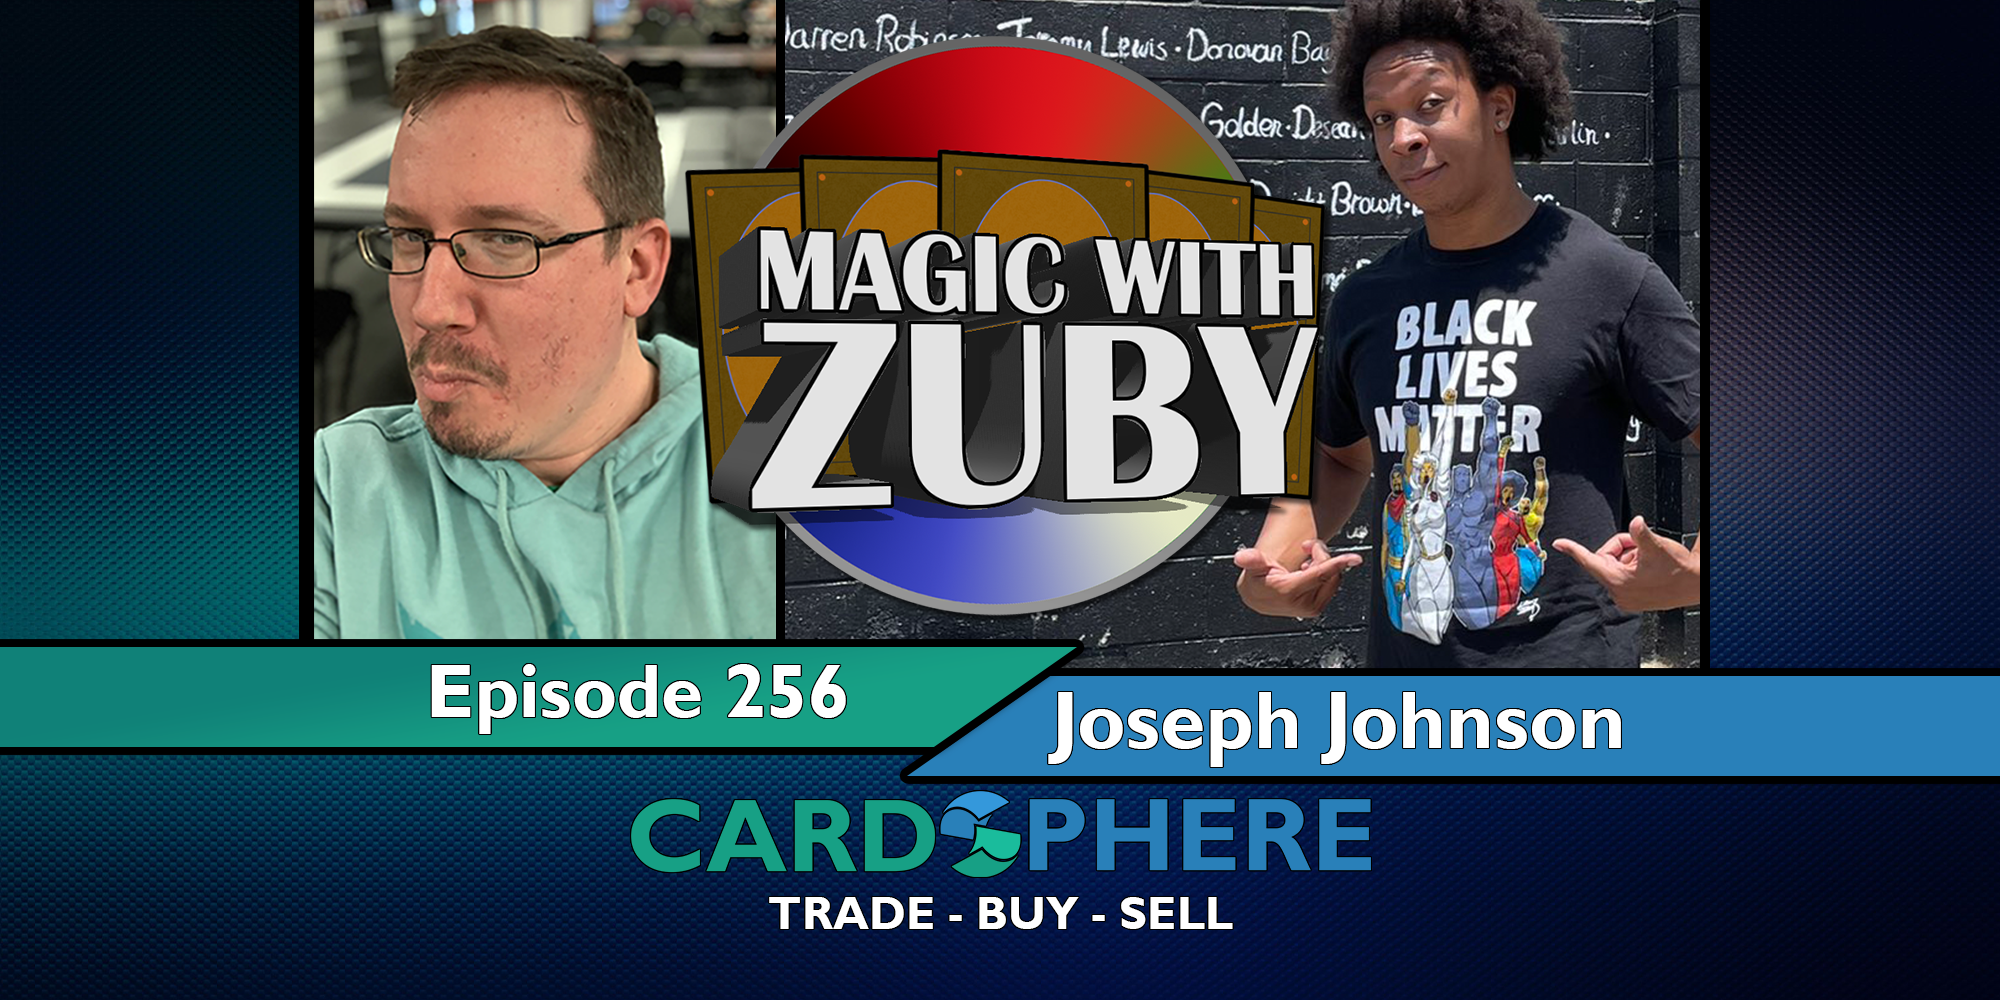 Magic With Zuby Episode 256 - Joseph Johnson, aka Blackneto